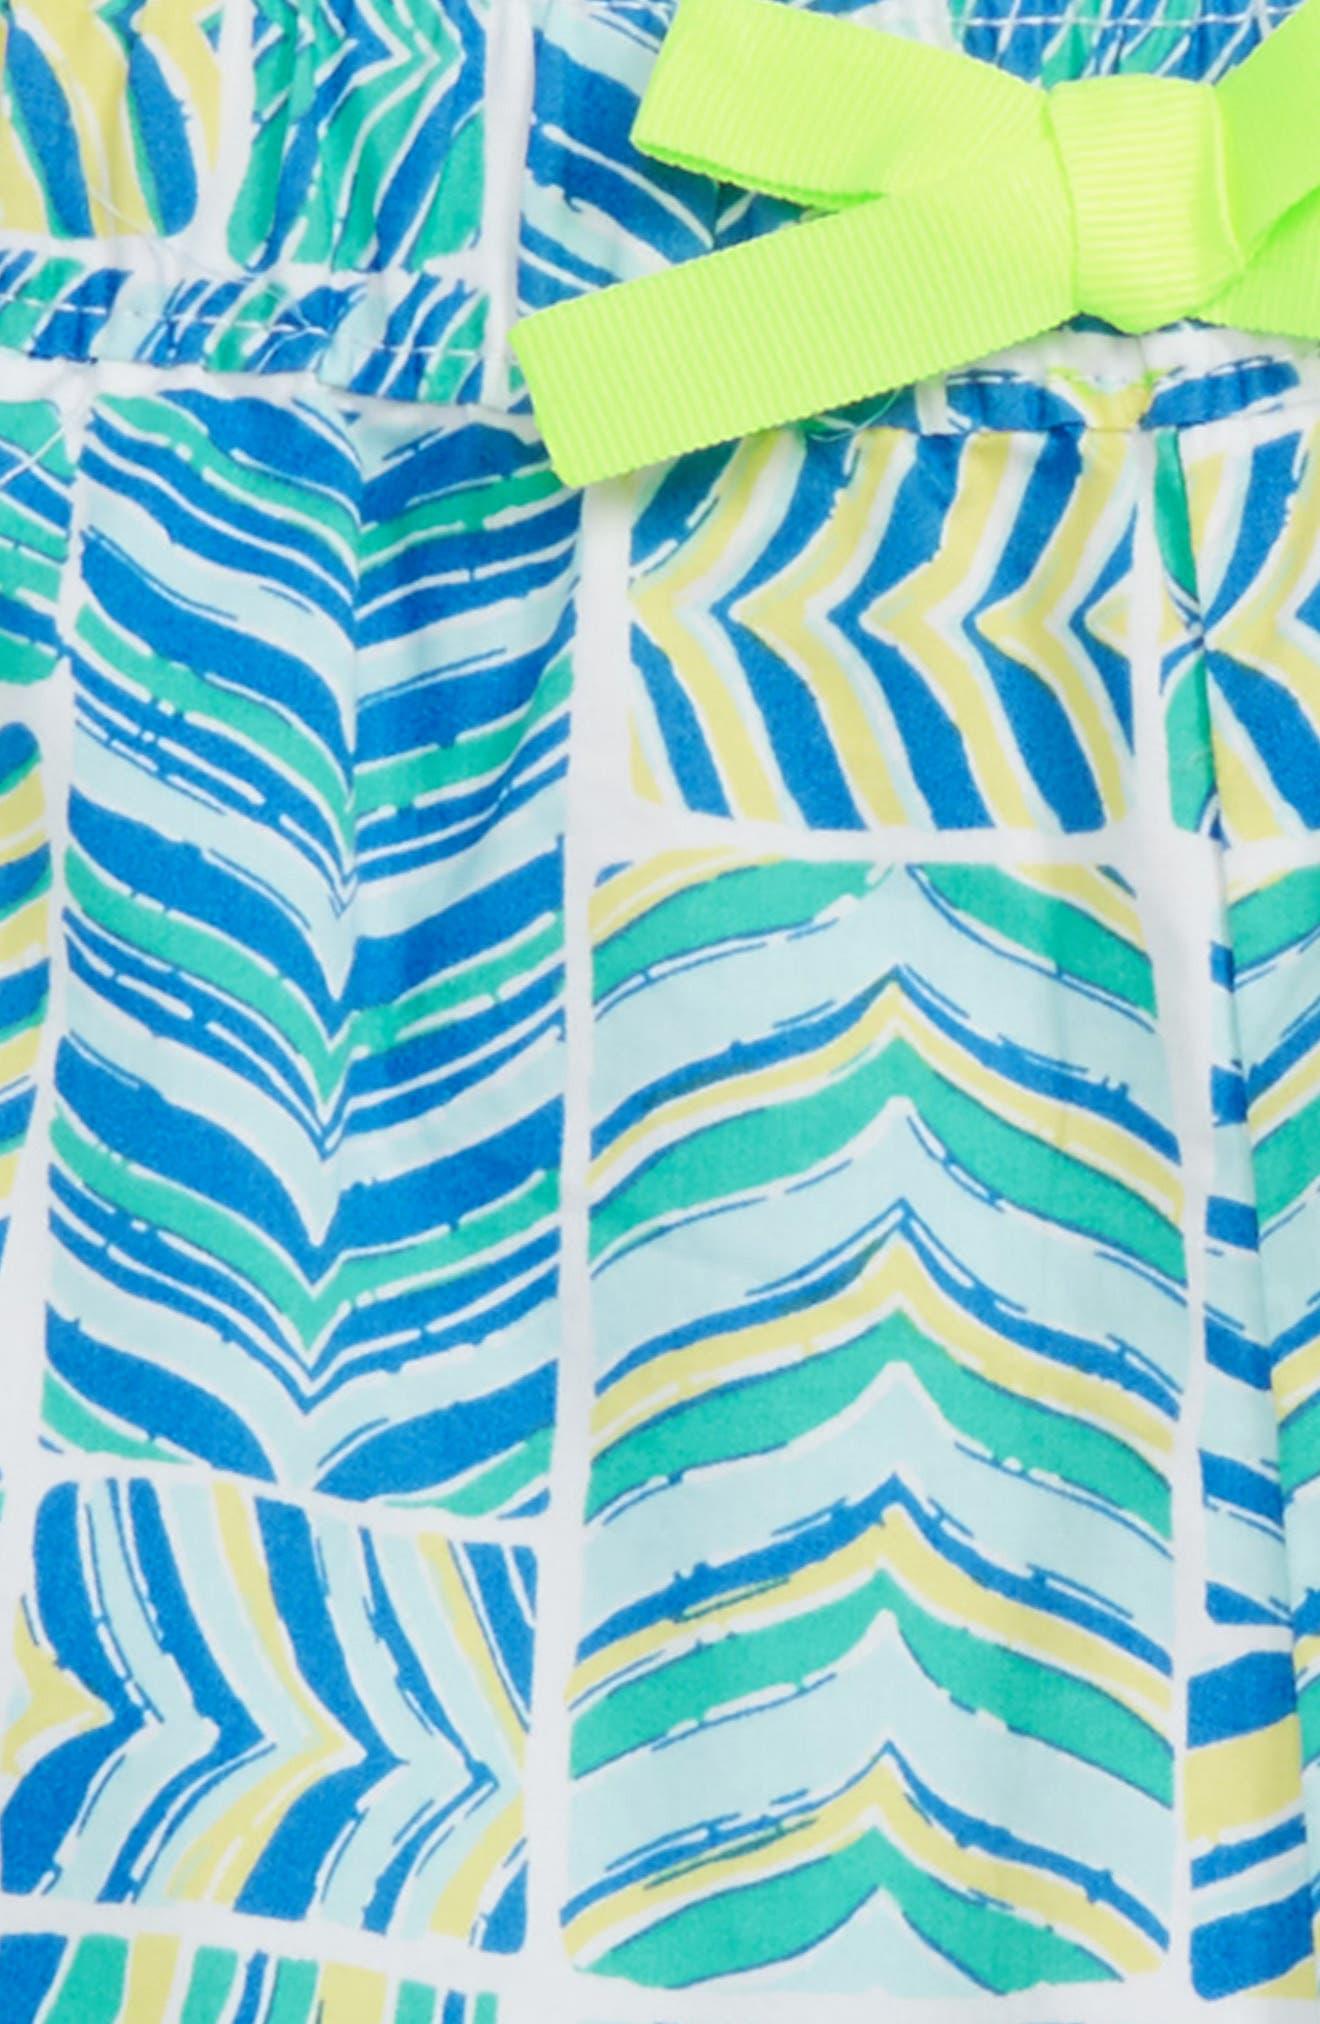 Whaletail Patchwork Shorts,                             Alternate thumbnail 3, color,                             Azure Blue